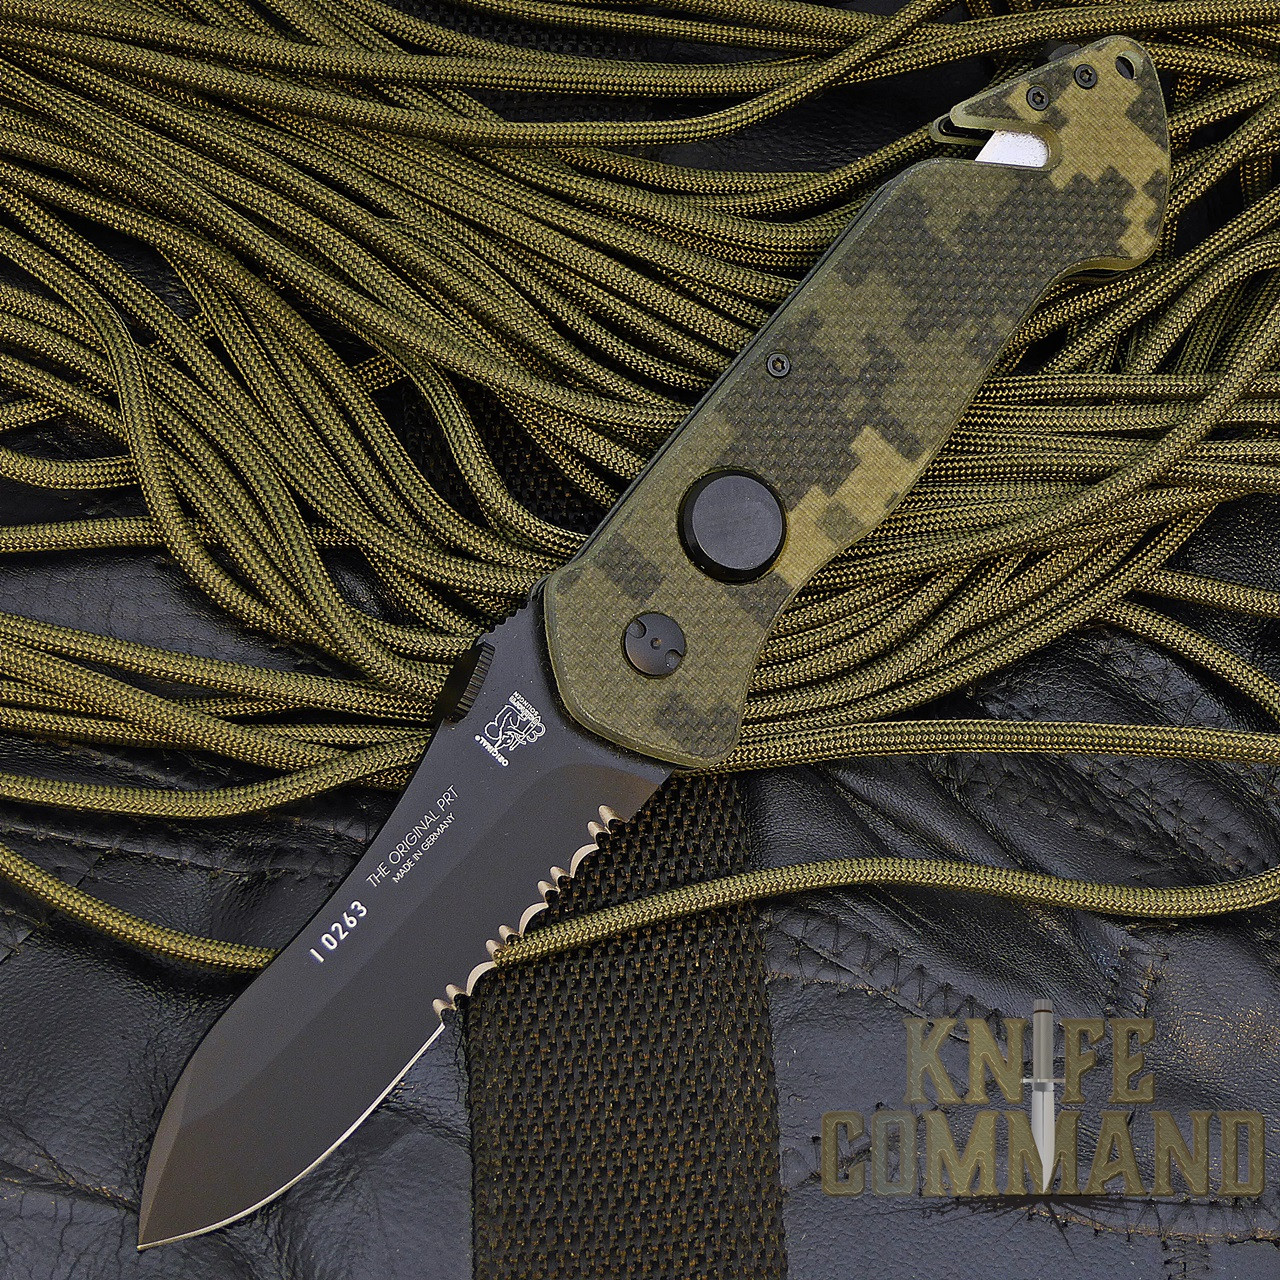 Eickhorn Solingen PRT X Digicam G10 Spearpoint Tactical Emergency Rescue Knife.  PRT-VIII now in Digicam.